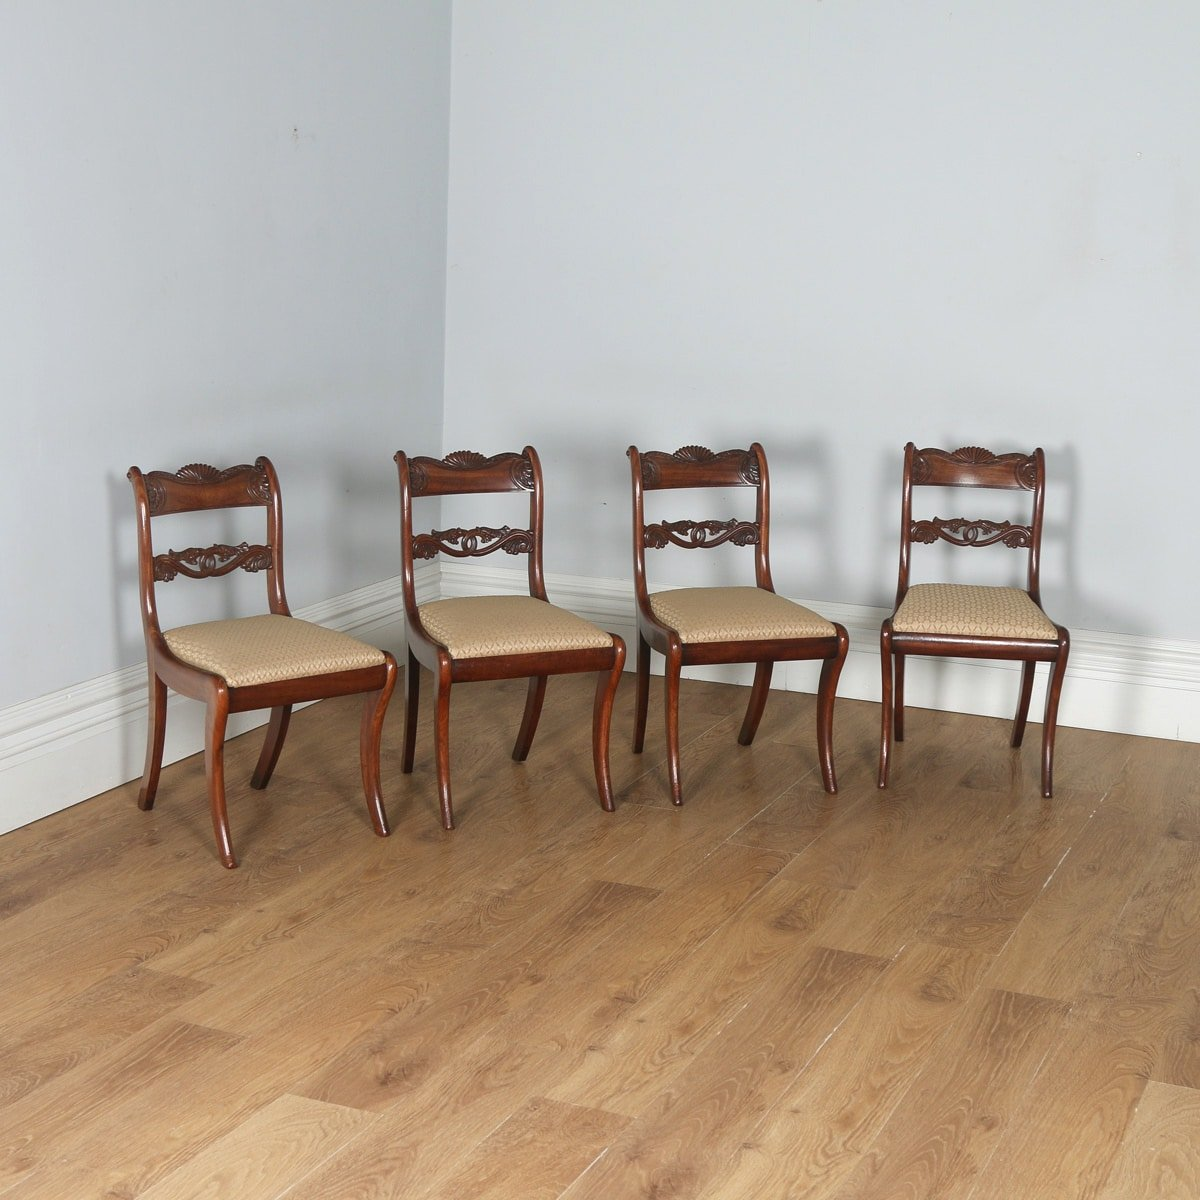 Antique English Georgian Regency Set of Four Mahogany Dining Chairs (Circa 1830)- yolagray.com